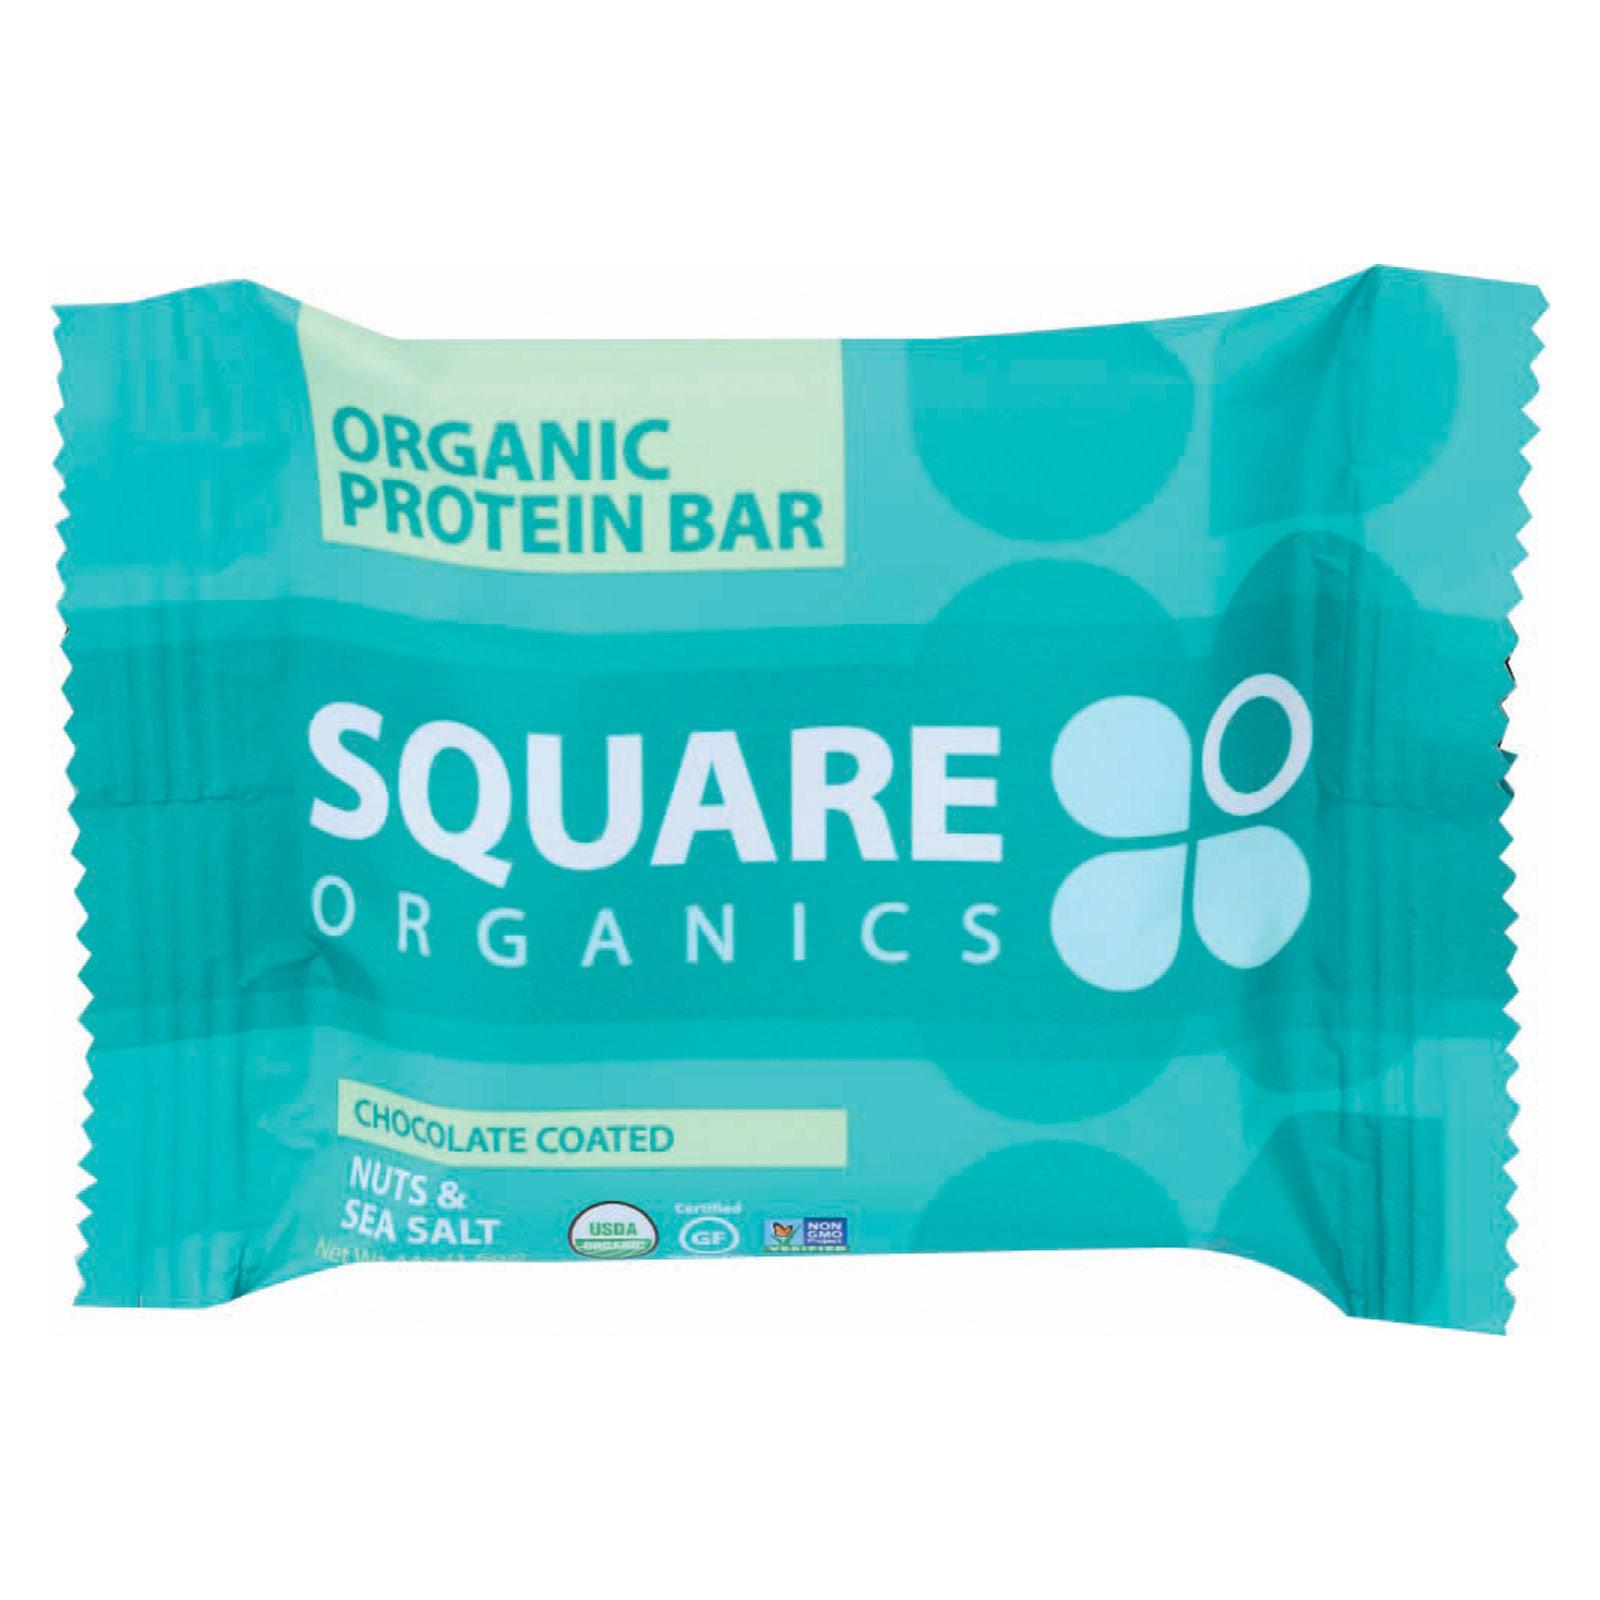 Square Organics Organic Protein Bar - Chocolate Coated Nuts & Sea Salt - Case of 12 - 1.6 oz